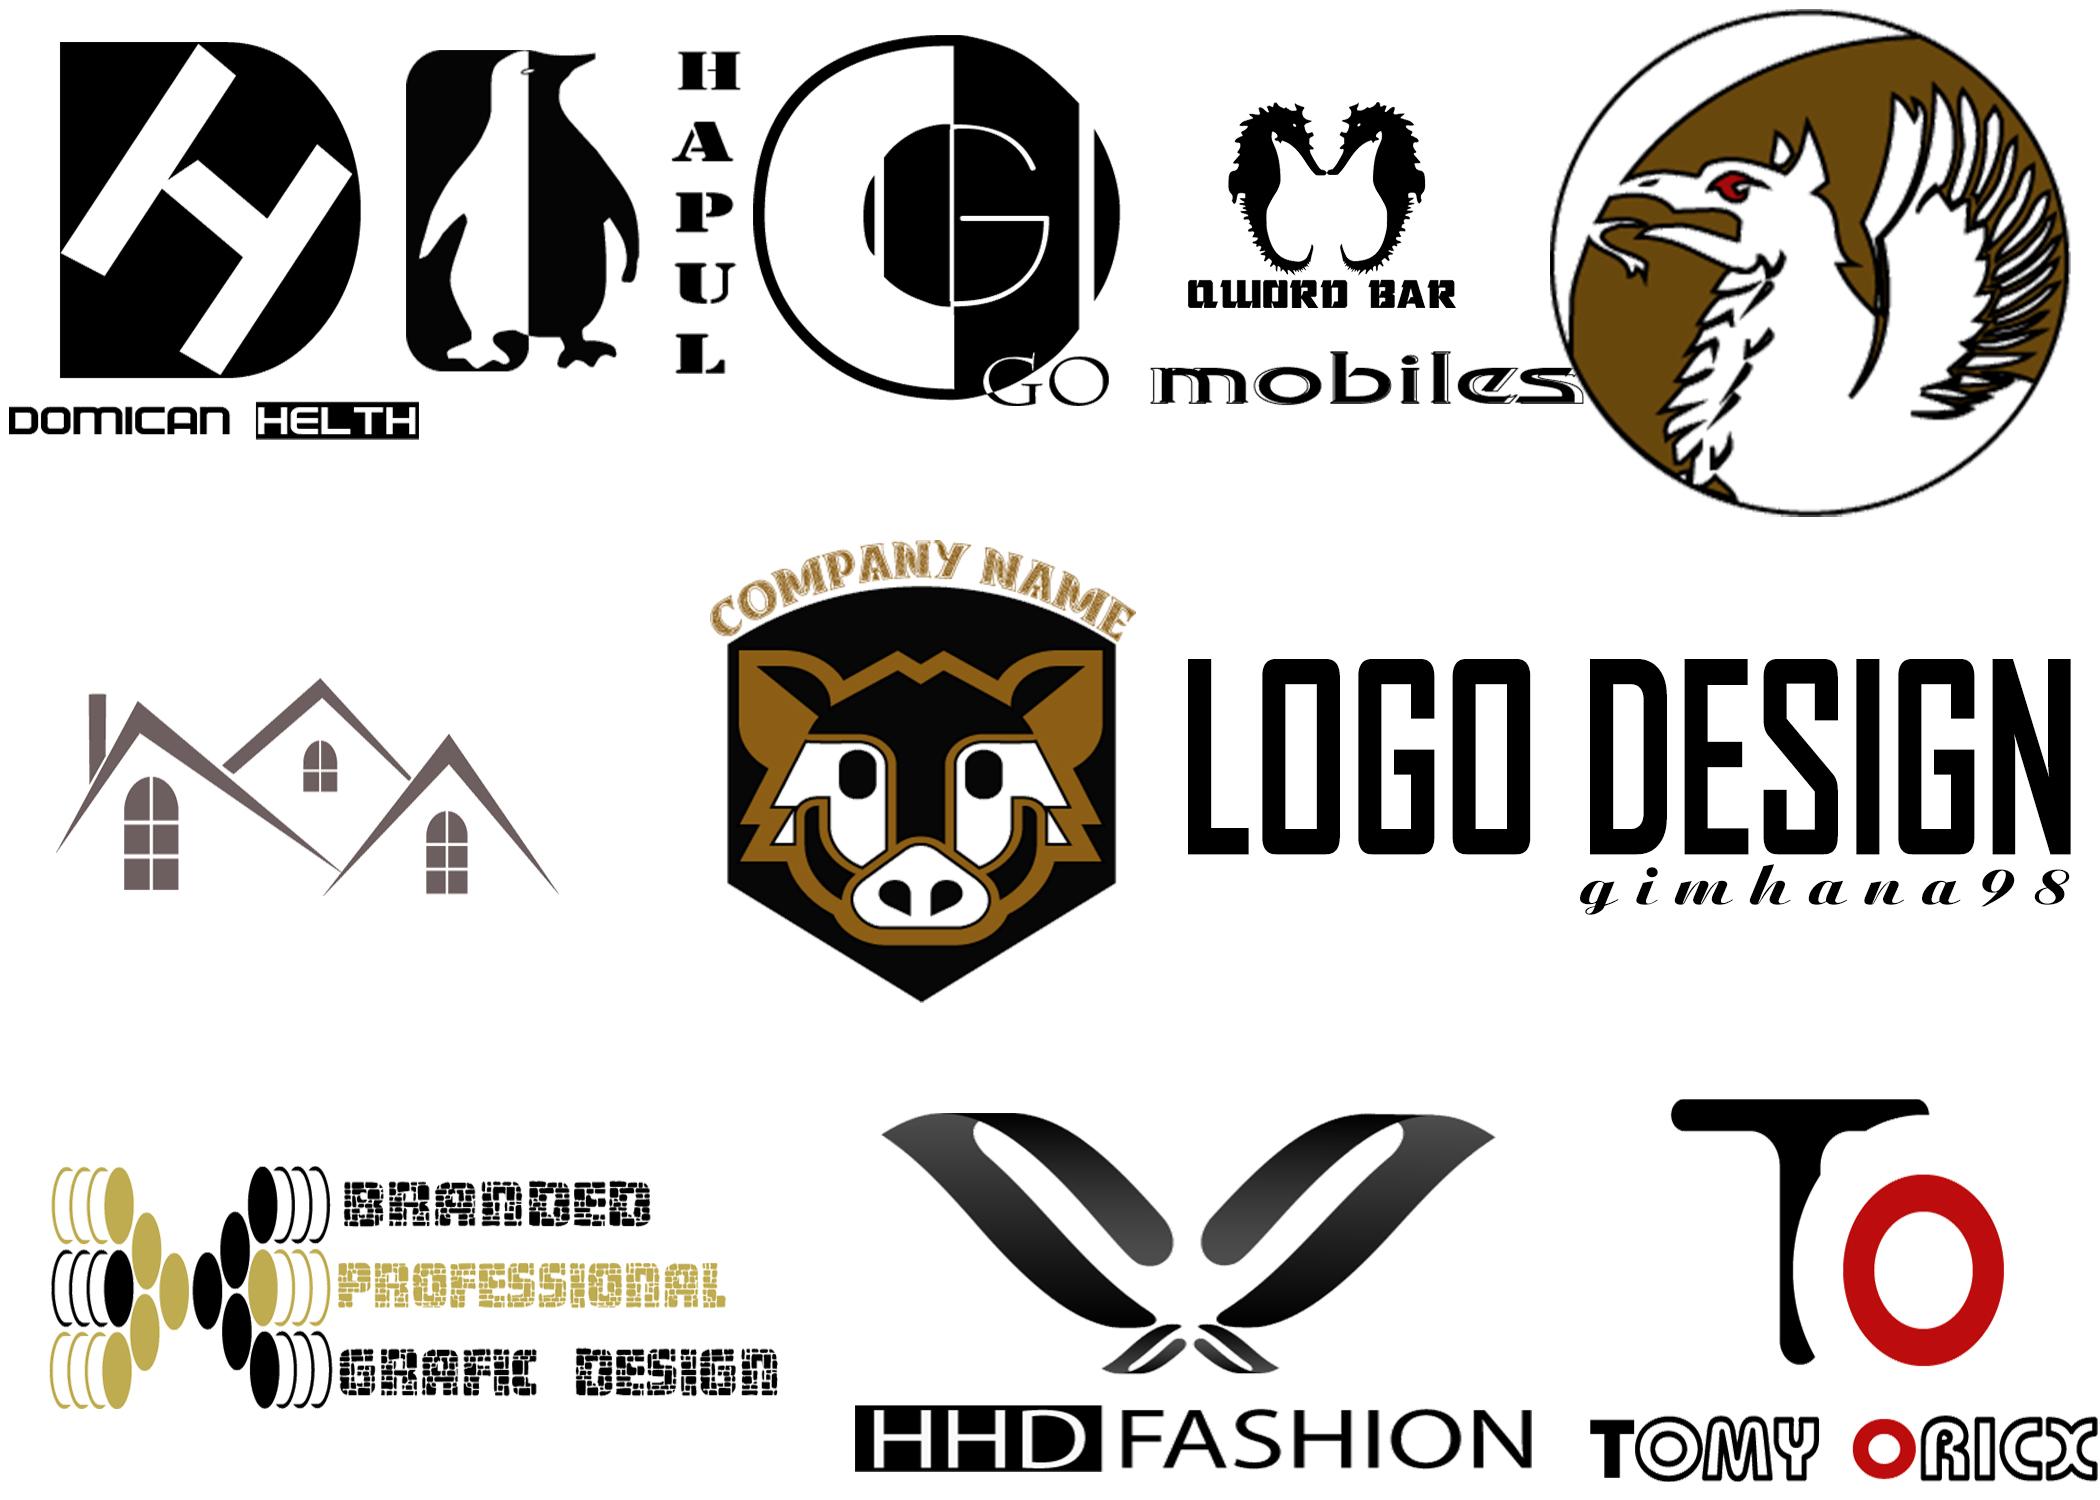 I will desin creative, unique logo in 24 hours